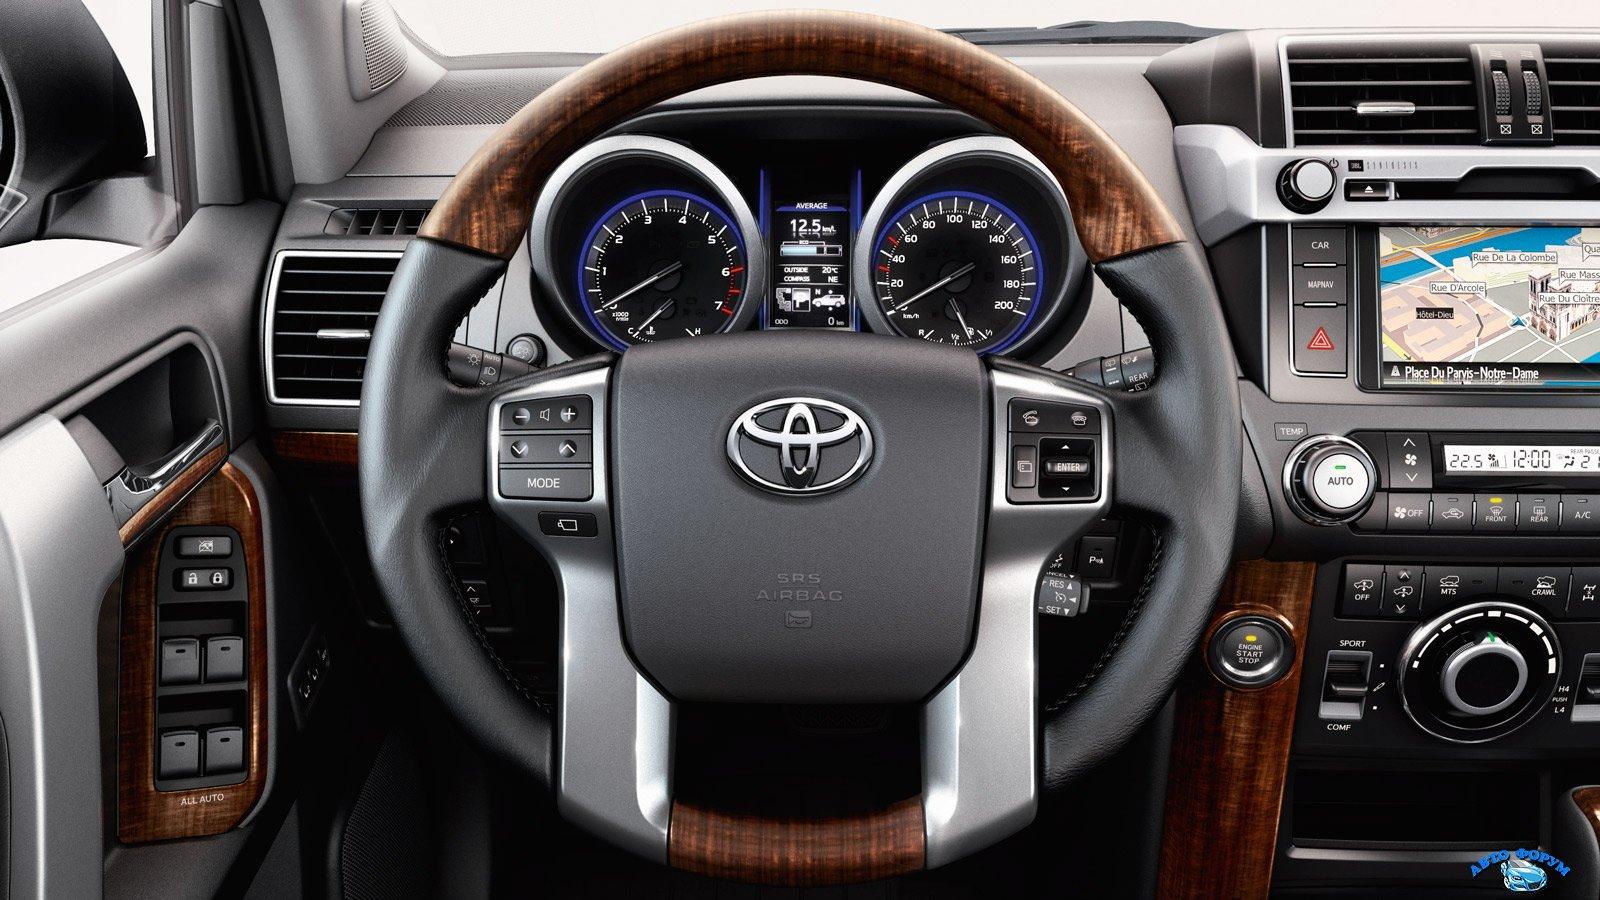 toyota-land-cruiser-2015-interior-tme-016-a-full_tcm-3020-452799.jpg